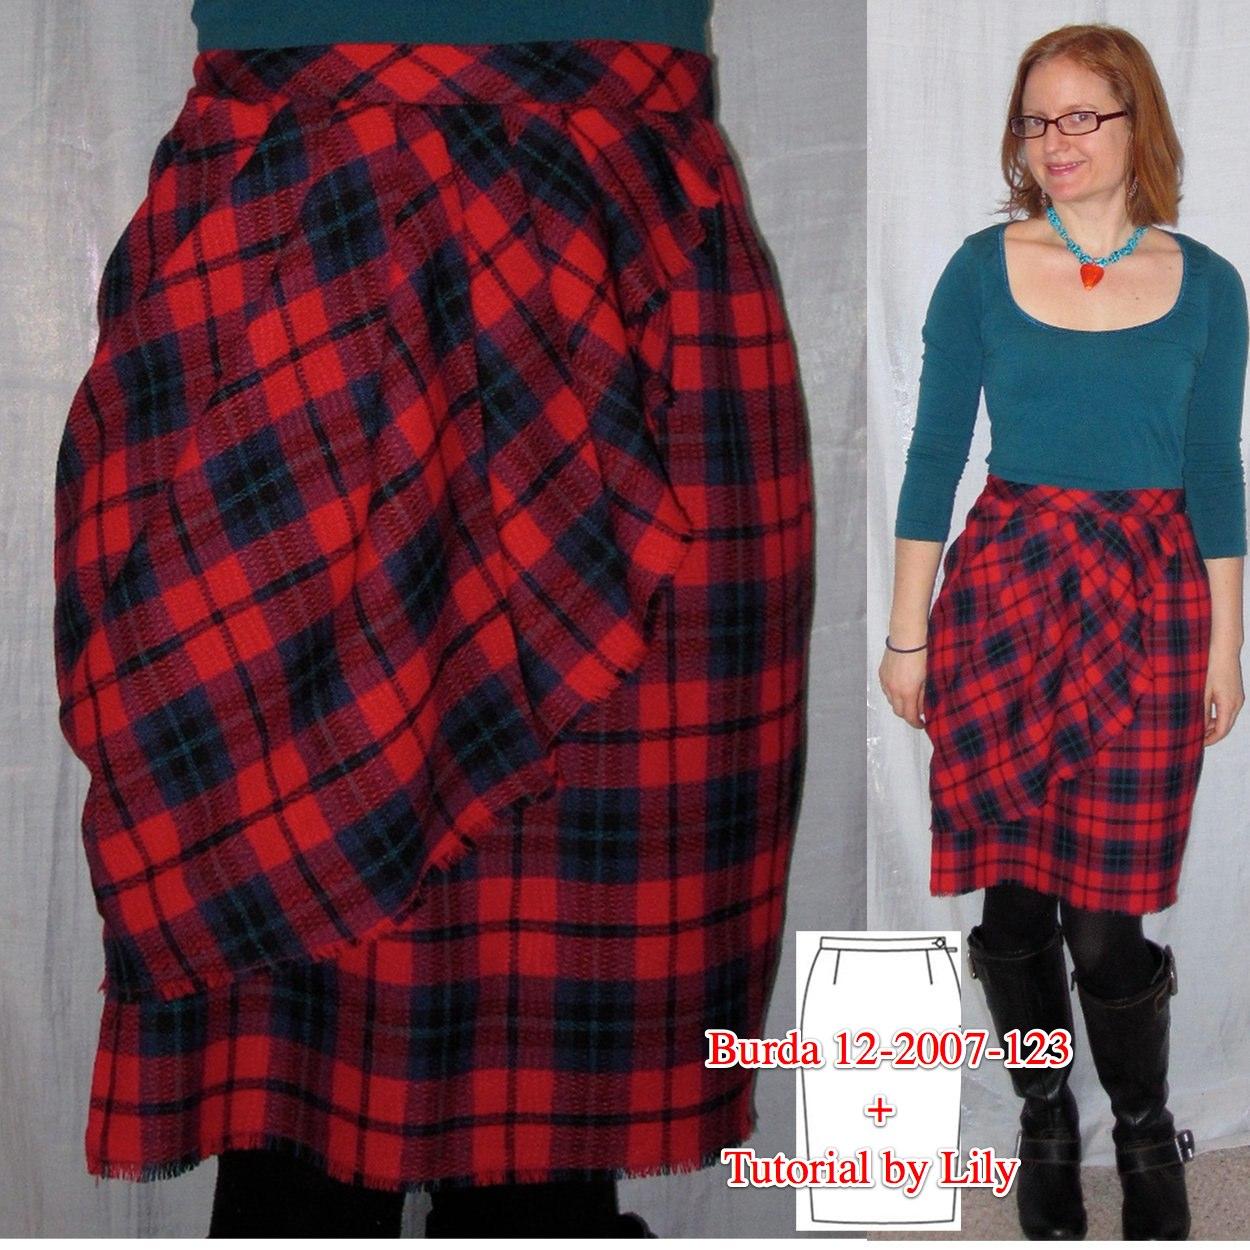 Burda 12-2007-123 Red Tartan Ruffle Skirt Thumbnail